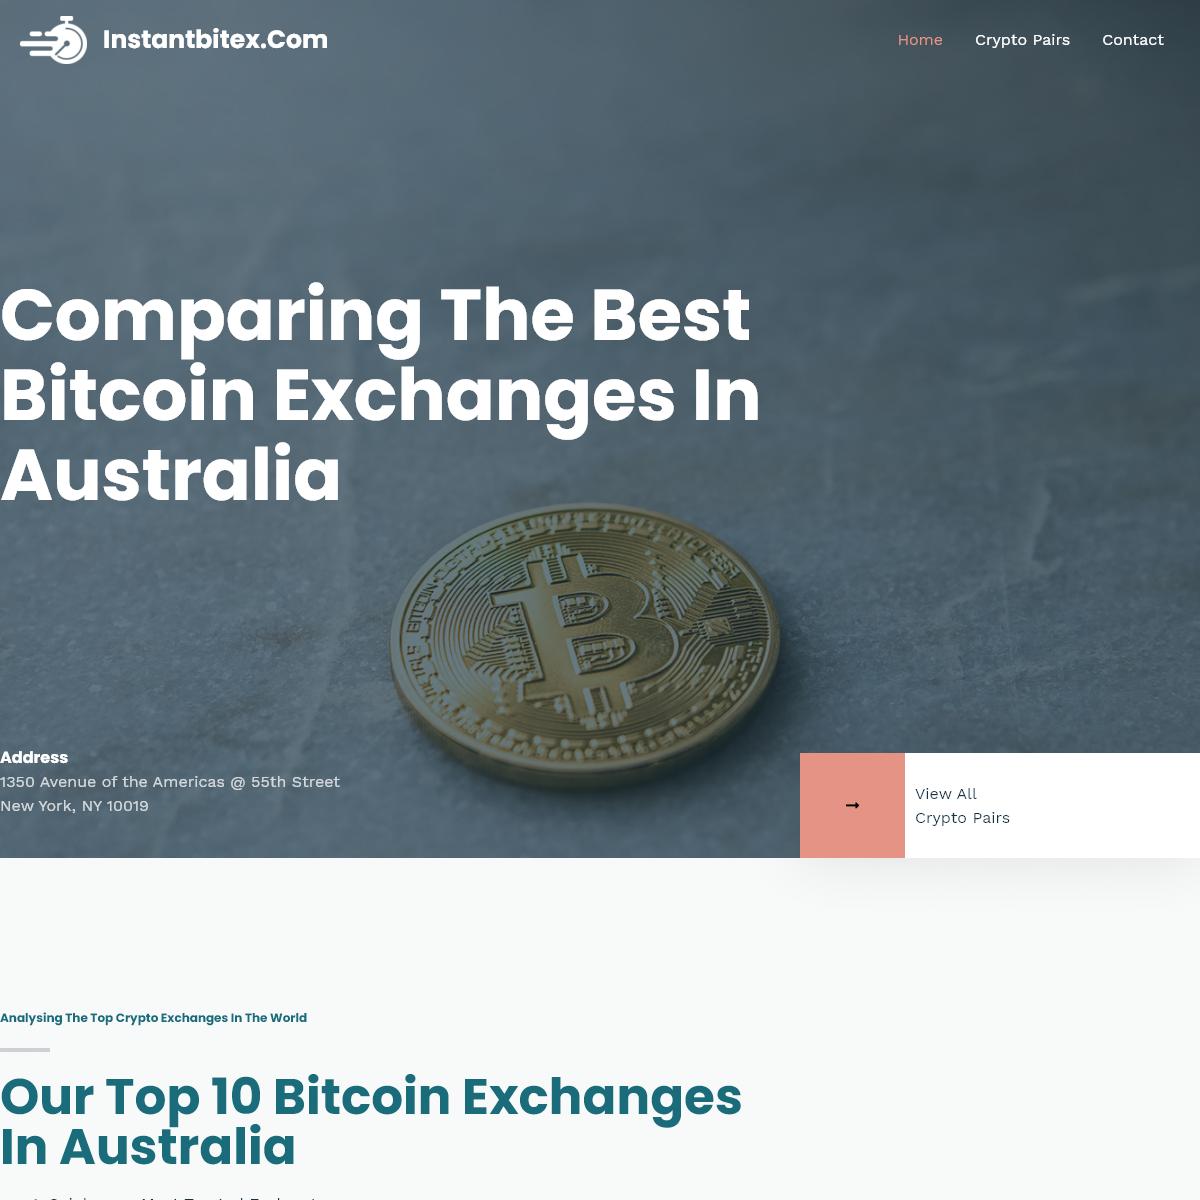 instantbitex.com - Find The Best Cryptocurrency Exchanges in Australia